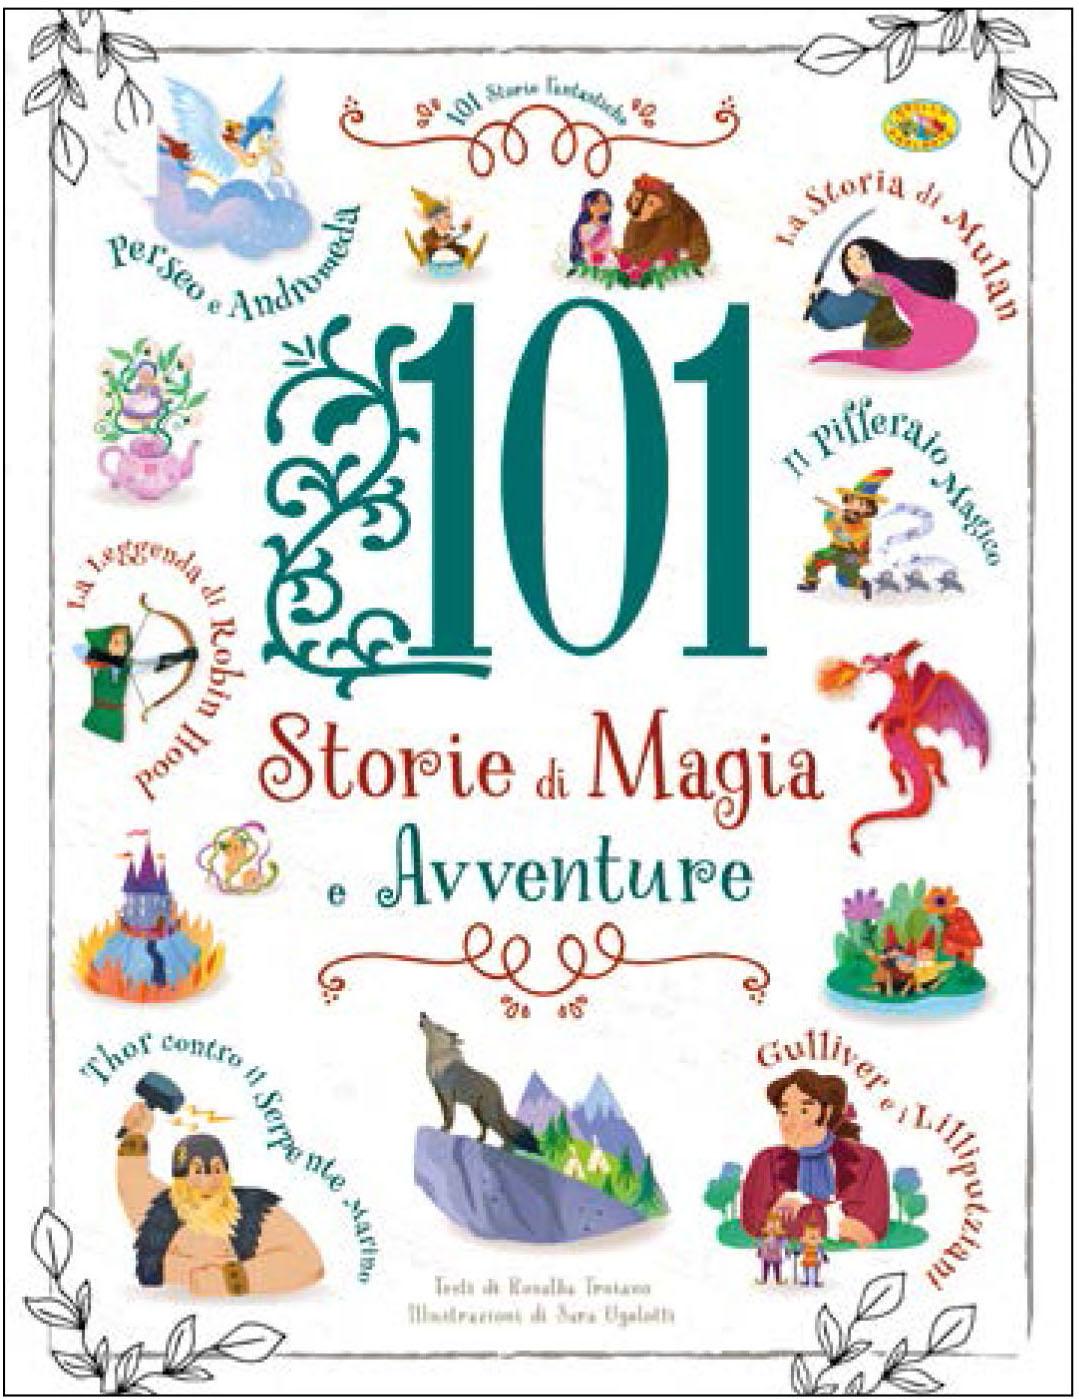 101 Storie di magia e avventure